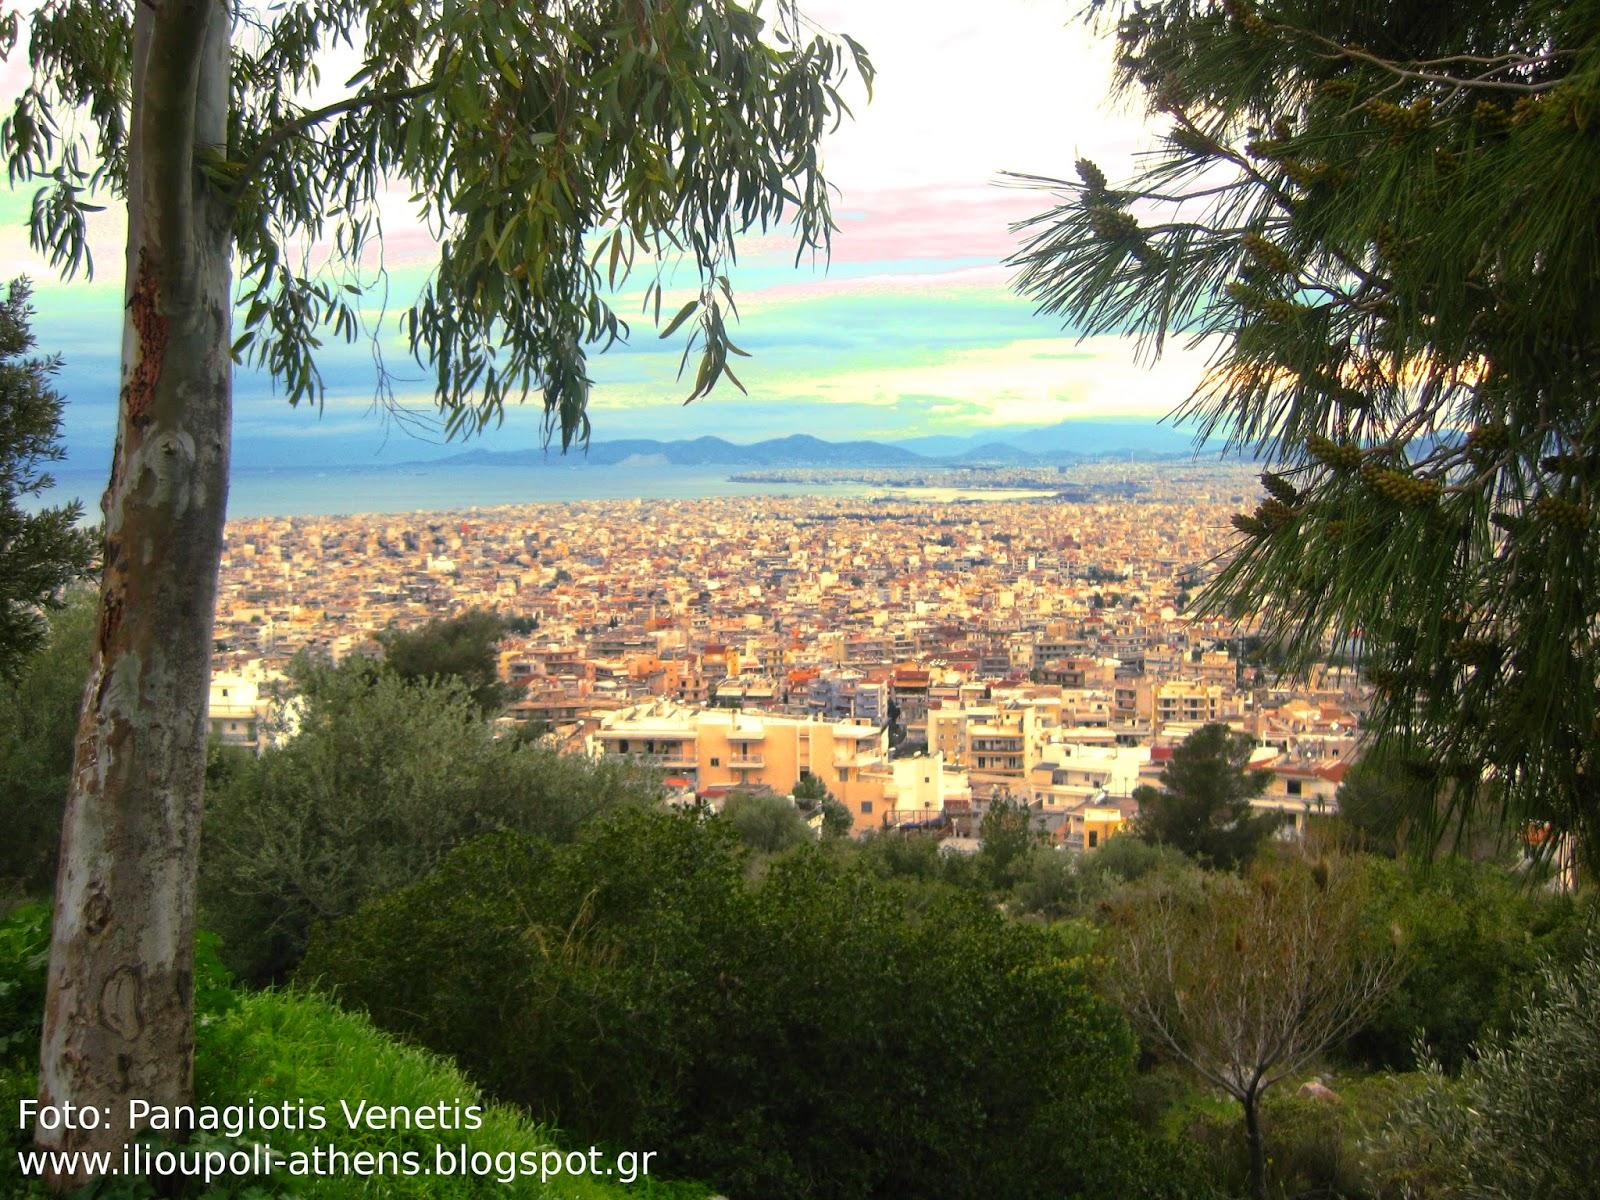 http://ilioupoli-athens.blogspot.gr/2015/03/blog-post_15.html